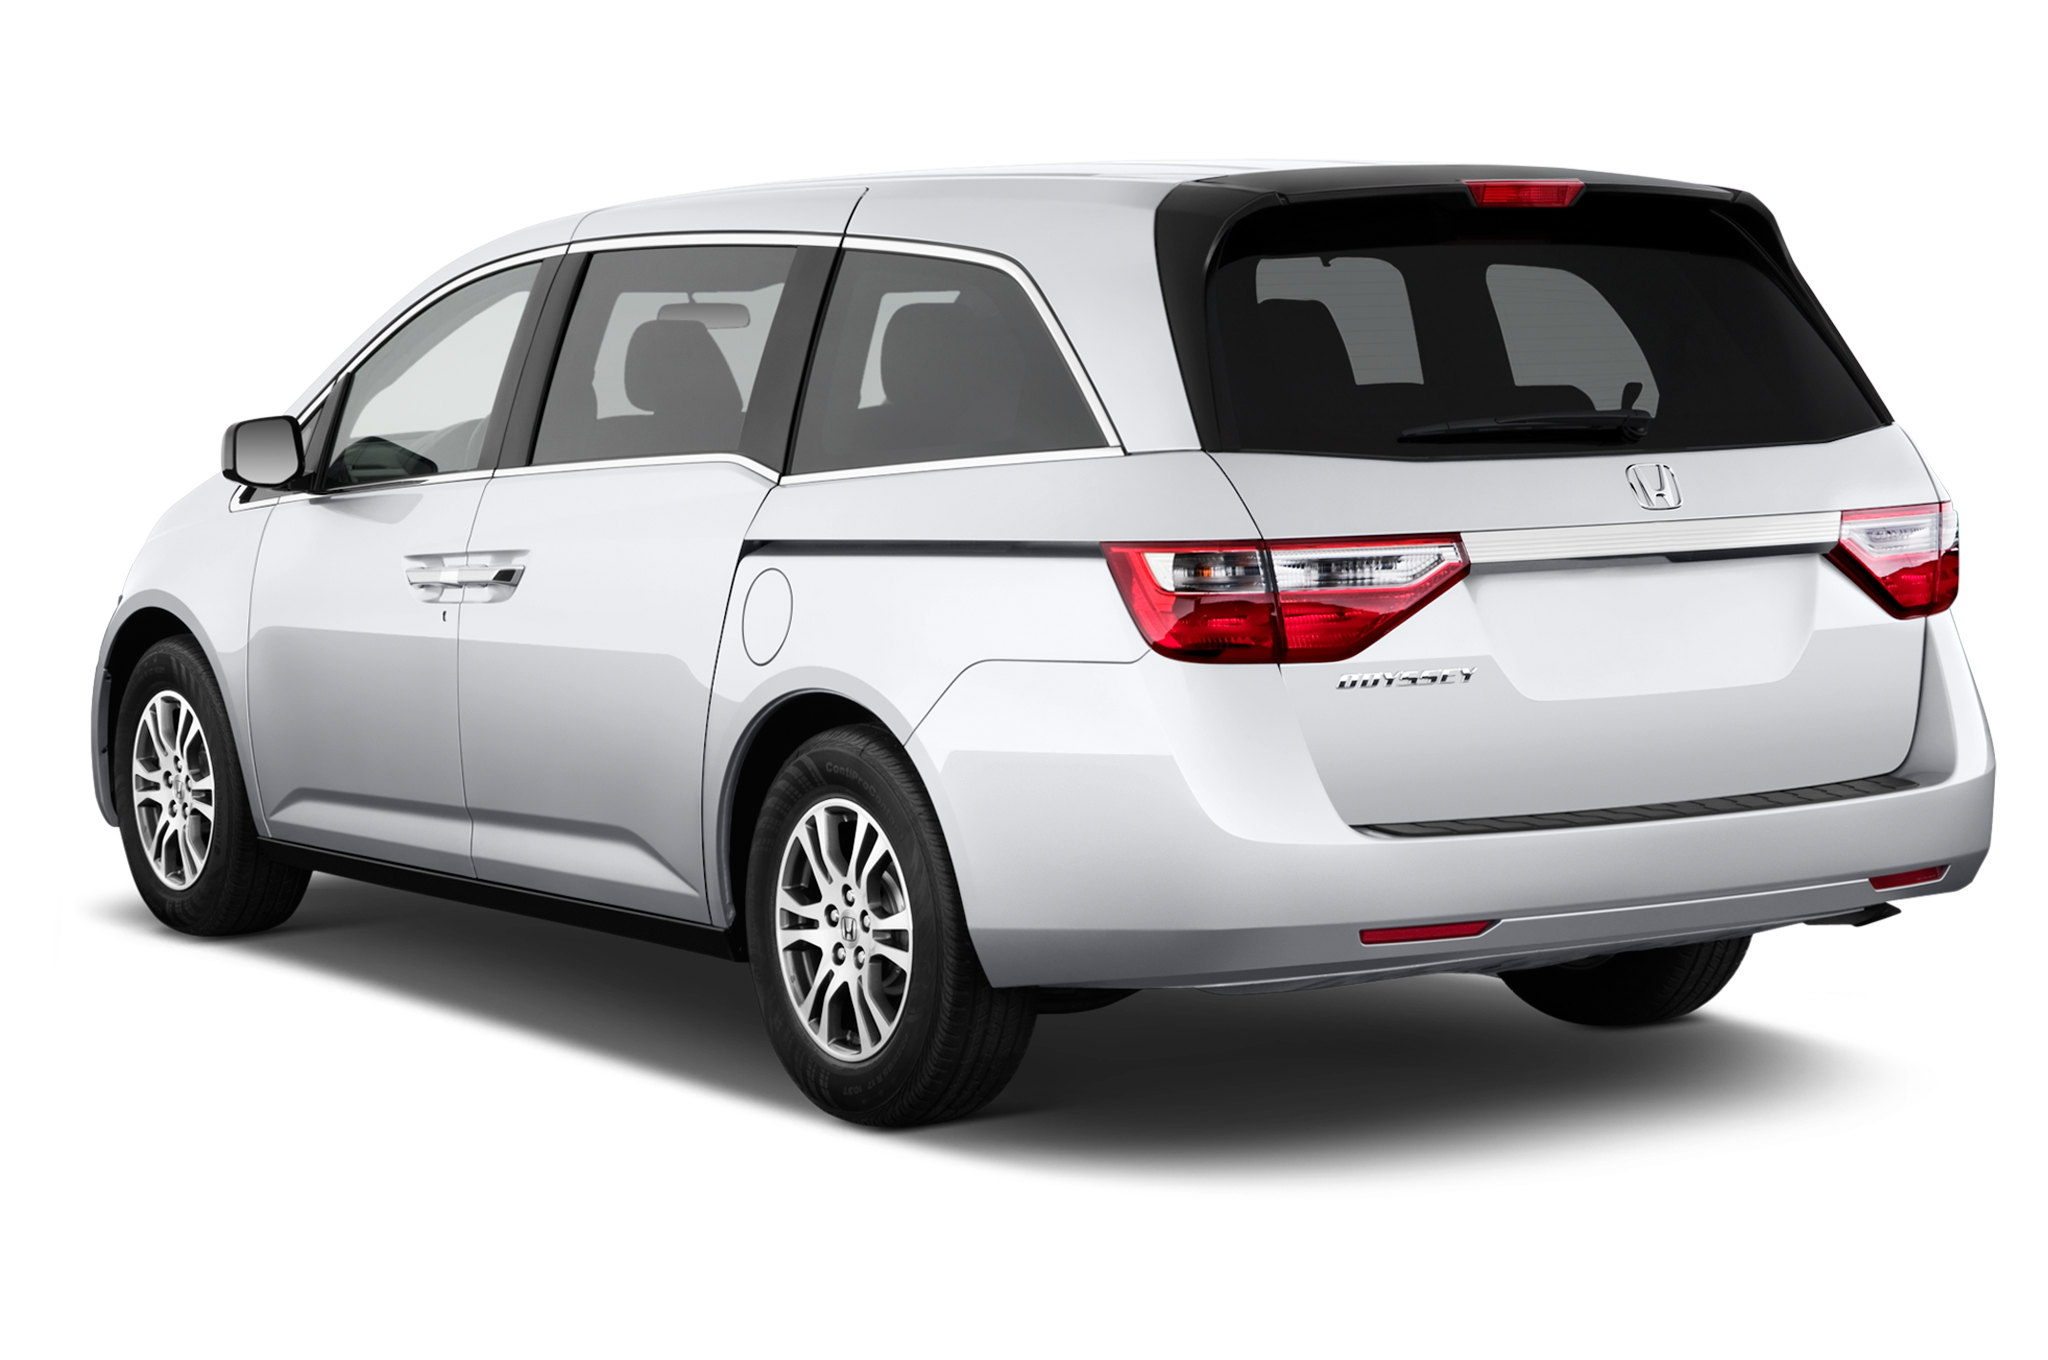 New York 2013: 2014 Acura MDX, Refreshed 2014 Honda Odyssey to Debut